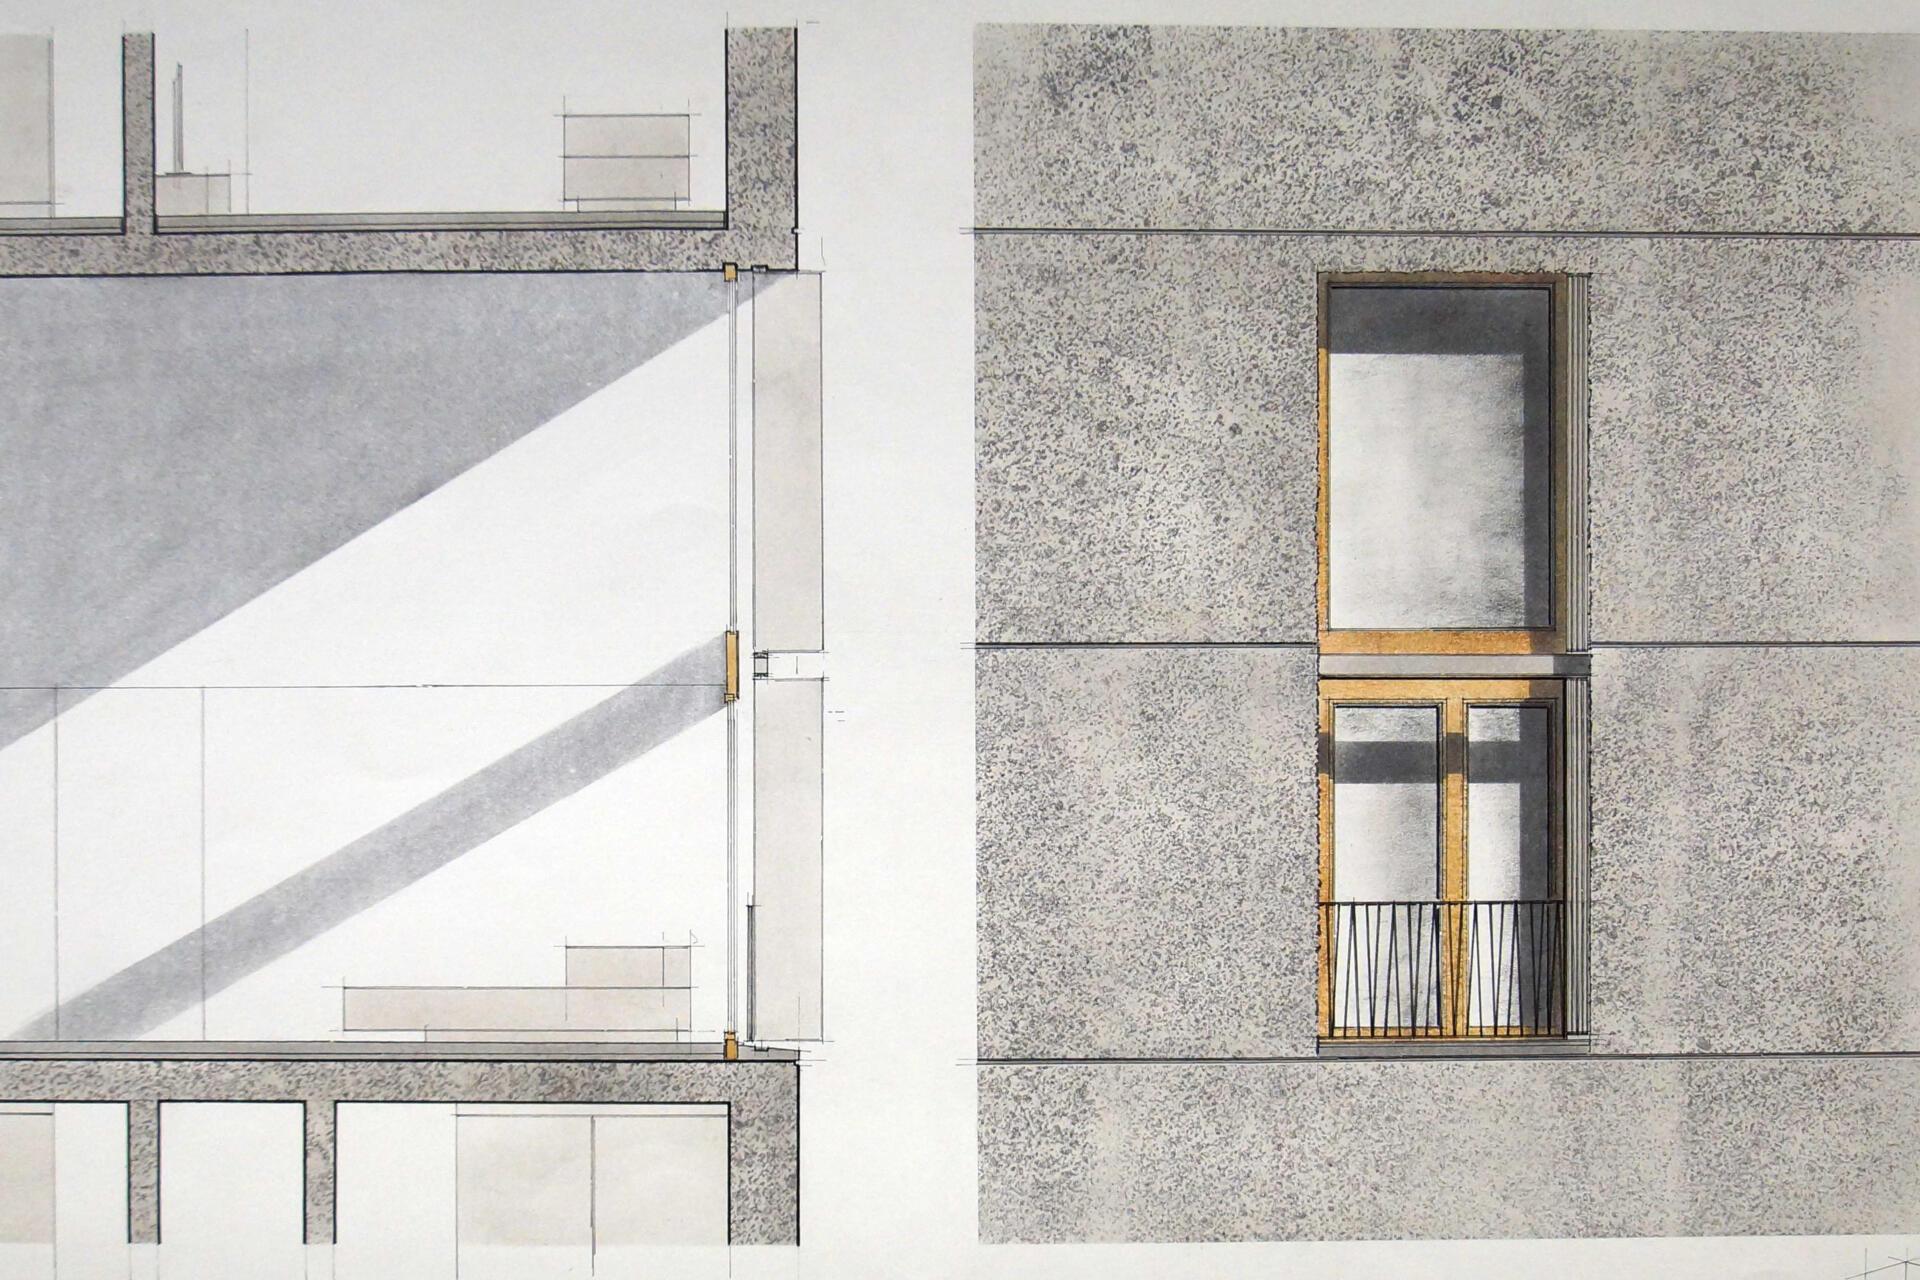 Wohnhaus 4